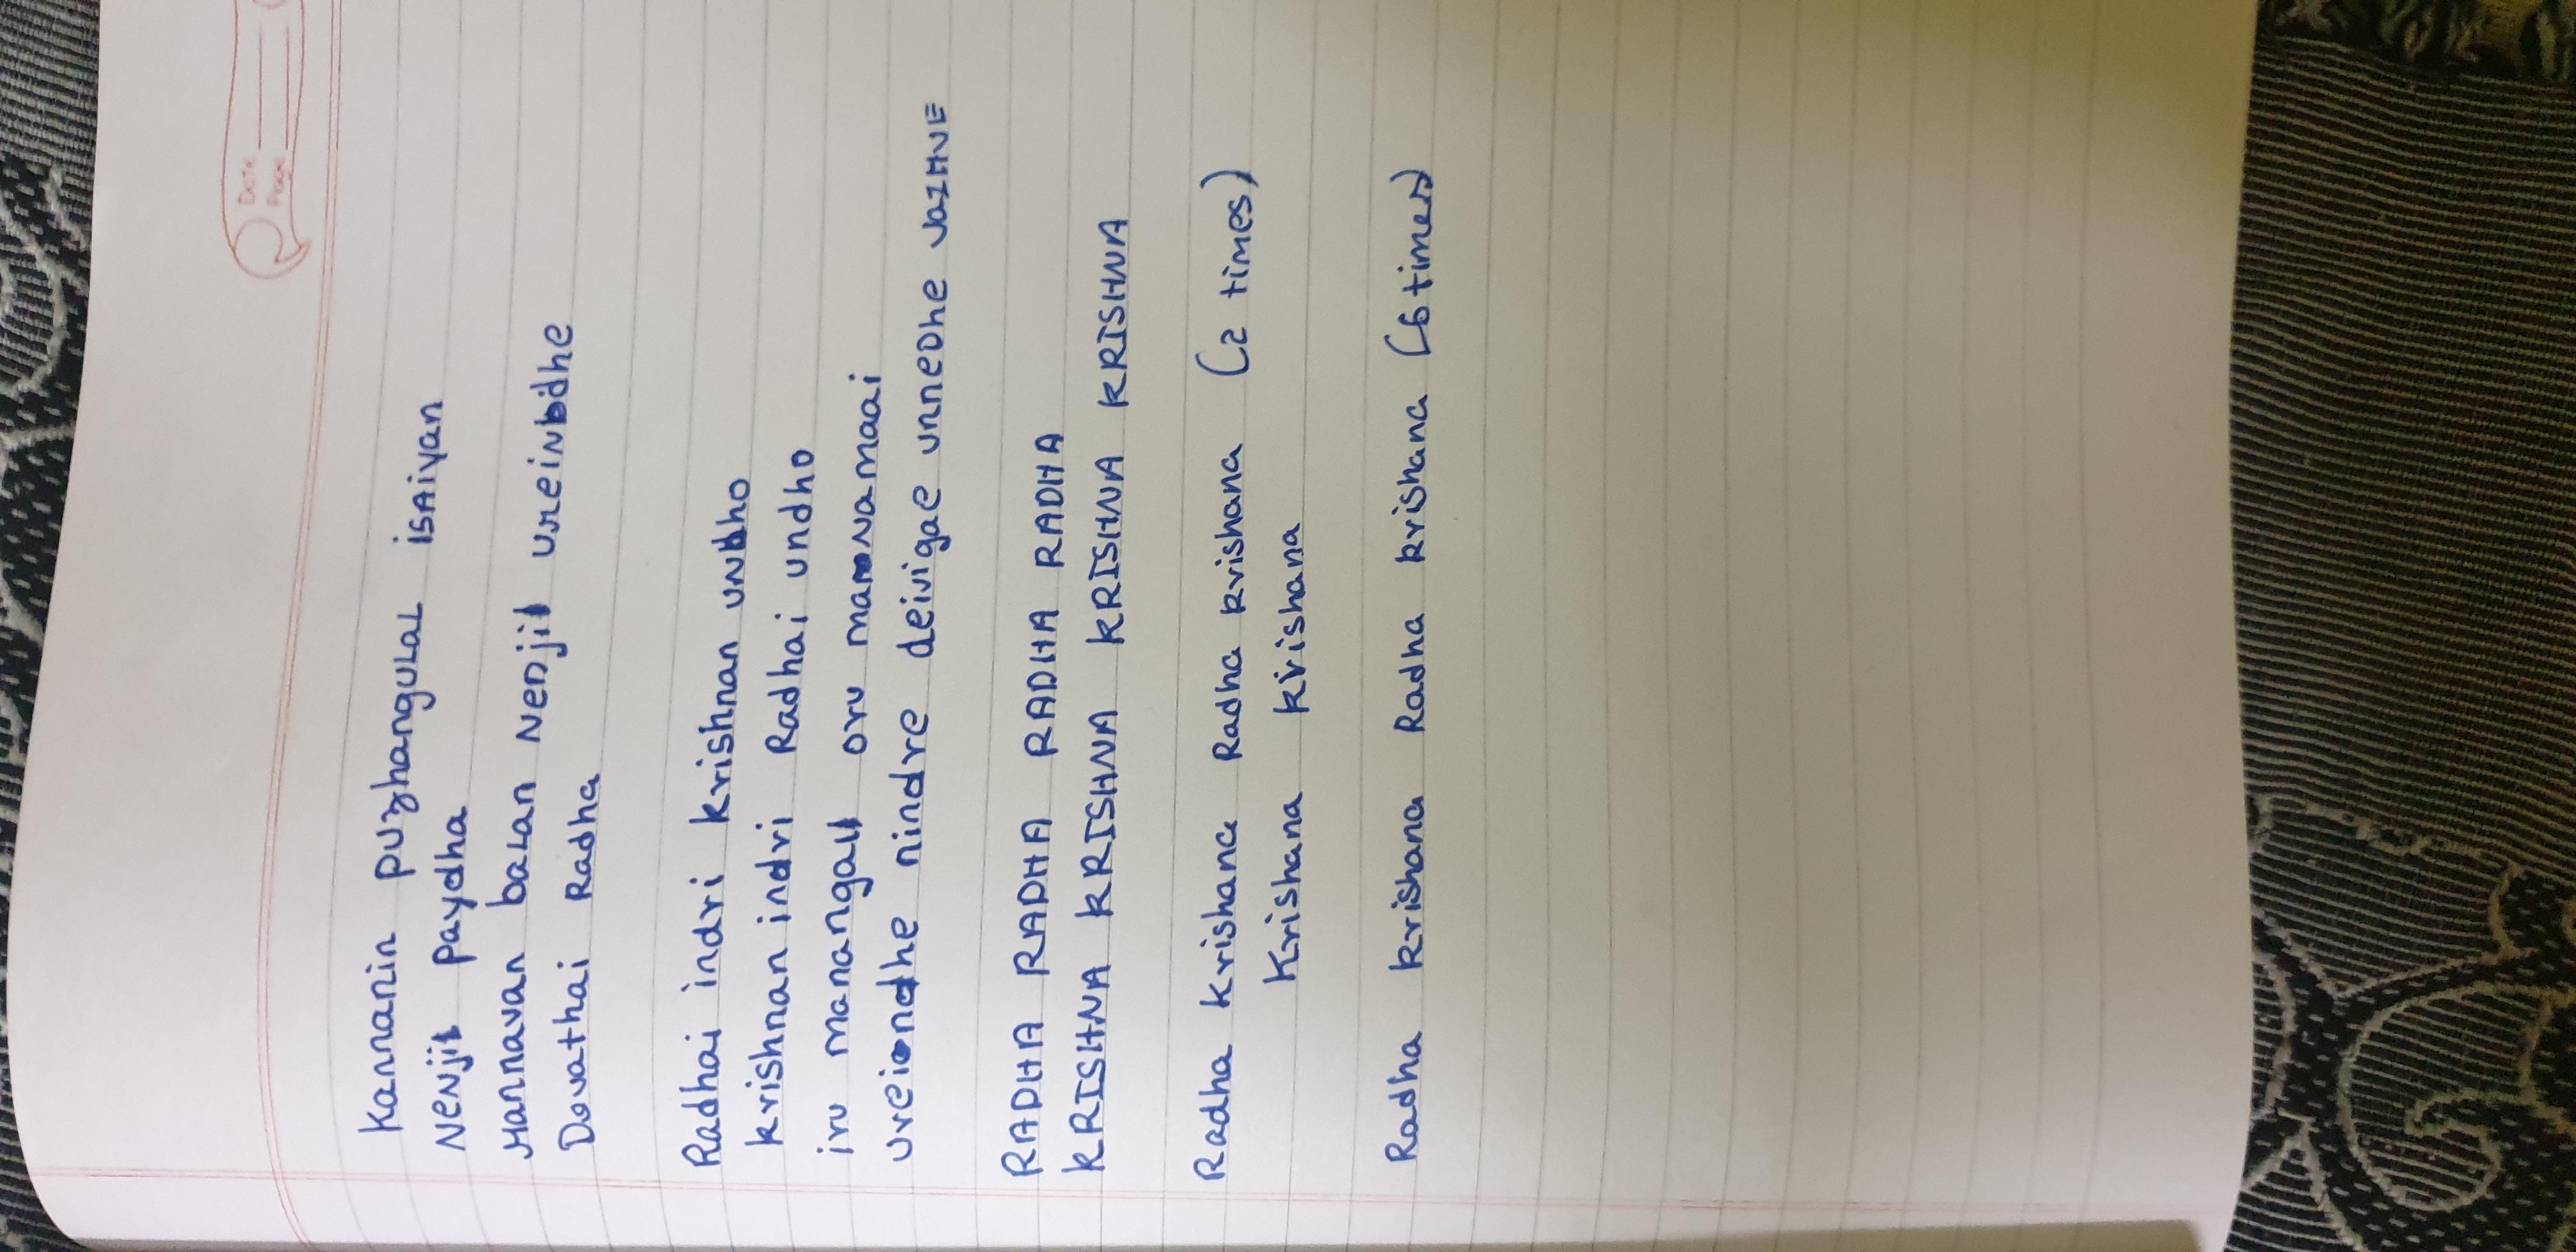 lyrics of all the songs of Radha Krishn( on star Bharat